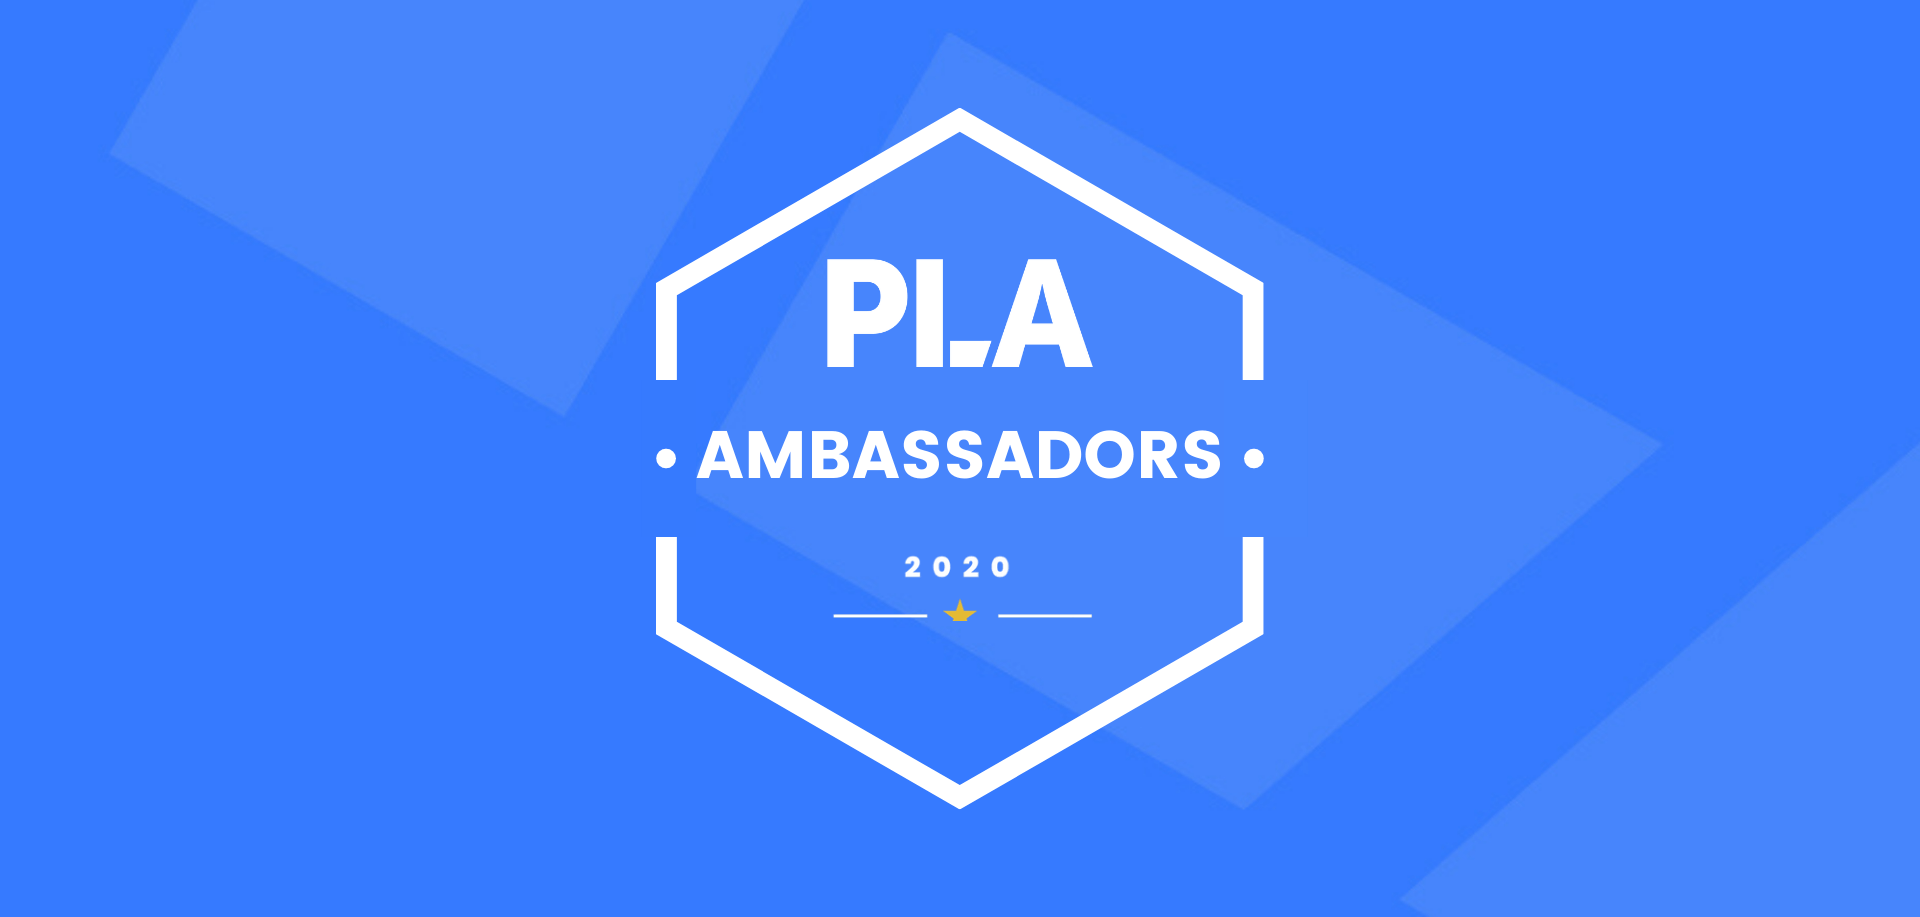 PLA Ambassadors